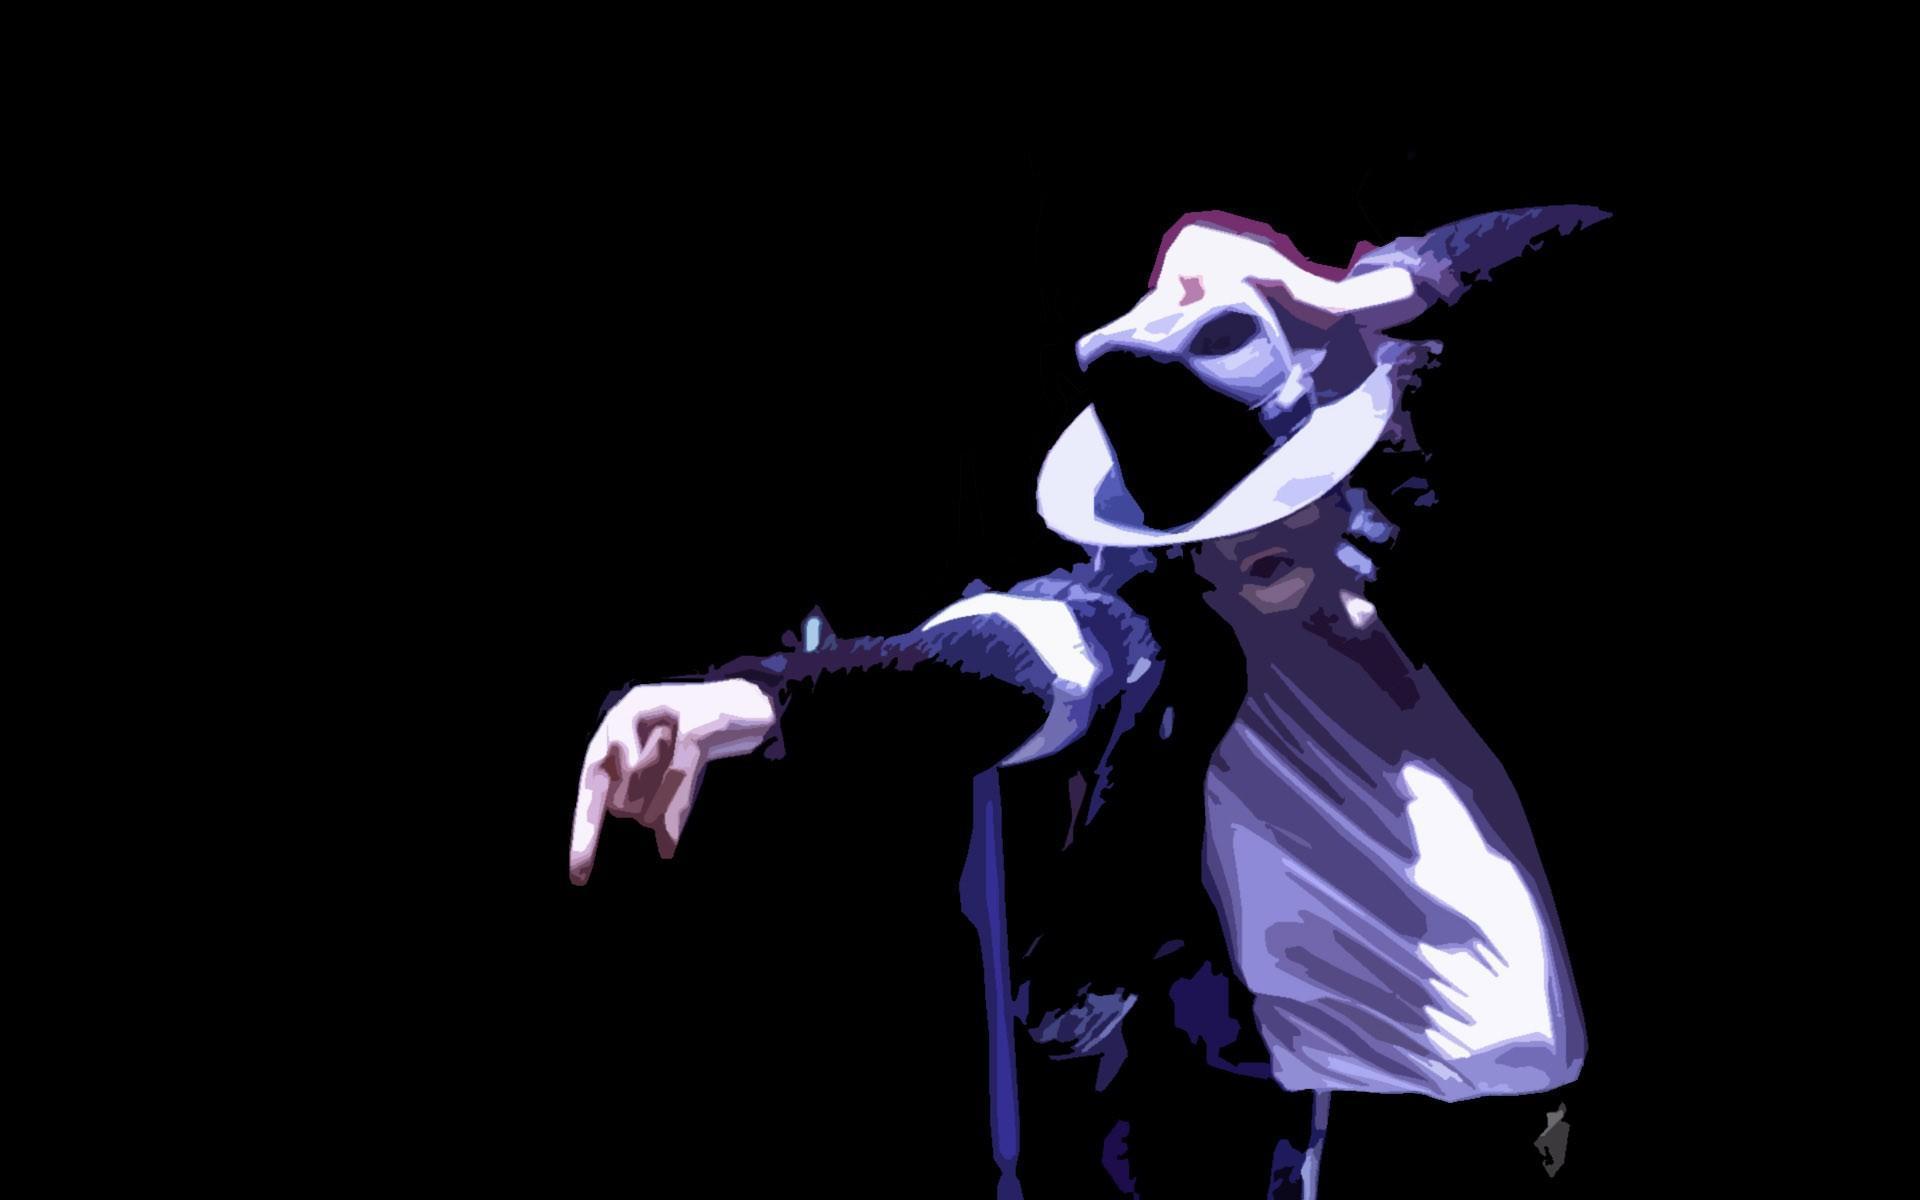 Michael Jackson Moon Walk Shine Desktop Wallpaper 1920x1200